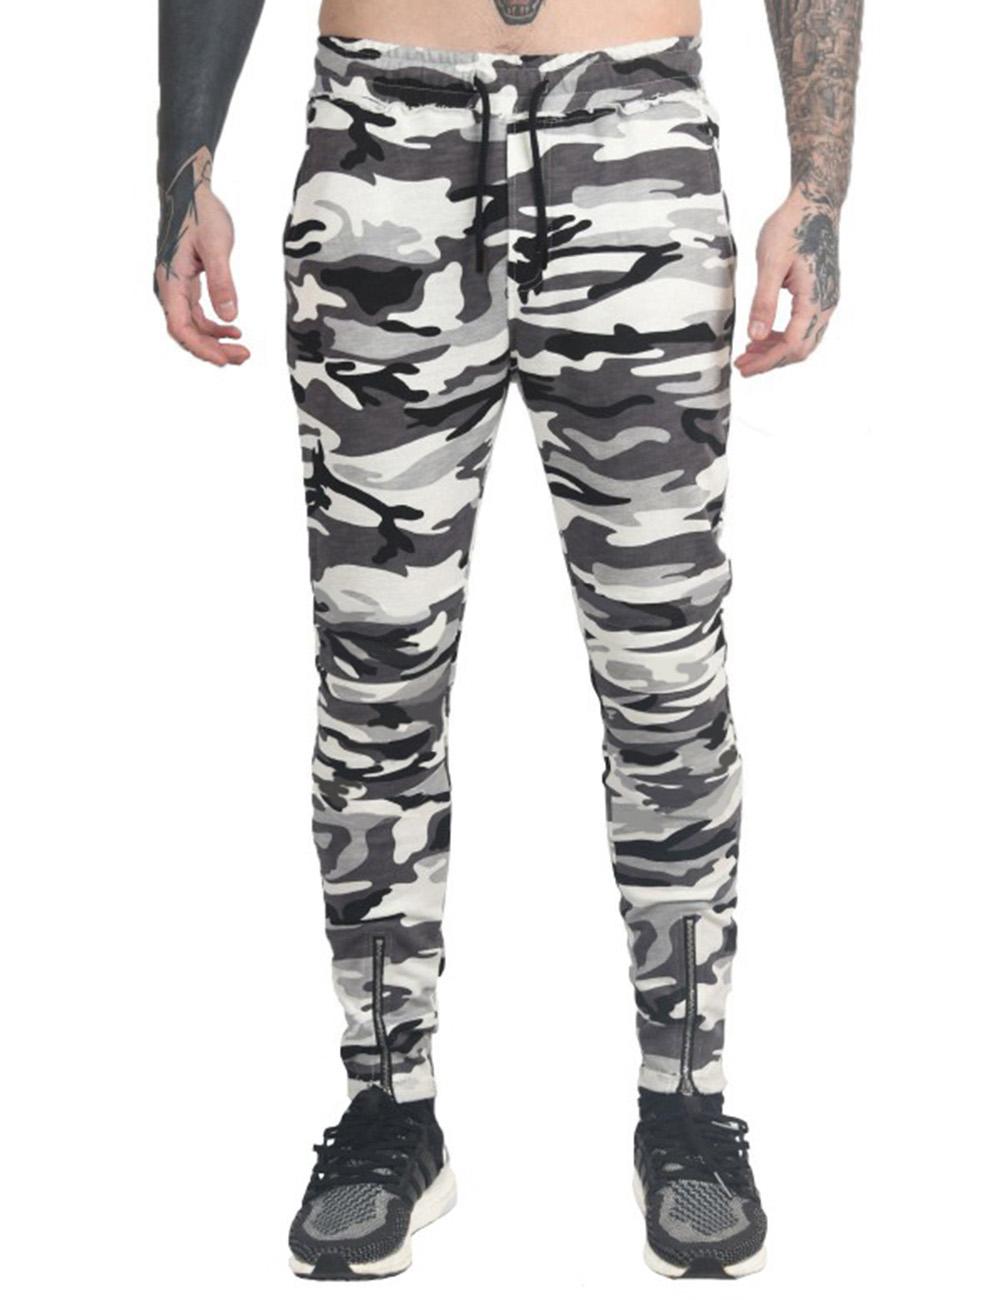 Stylish Men Camouflage Sports Trousers with Zipper Leg Opening Elastic Band Waist Long Pants Gift White Camo_M